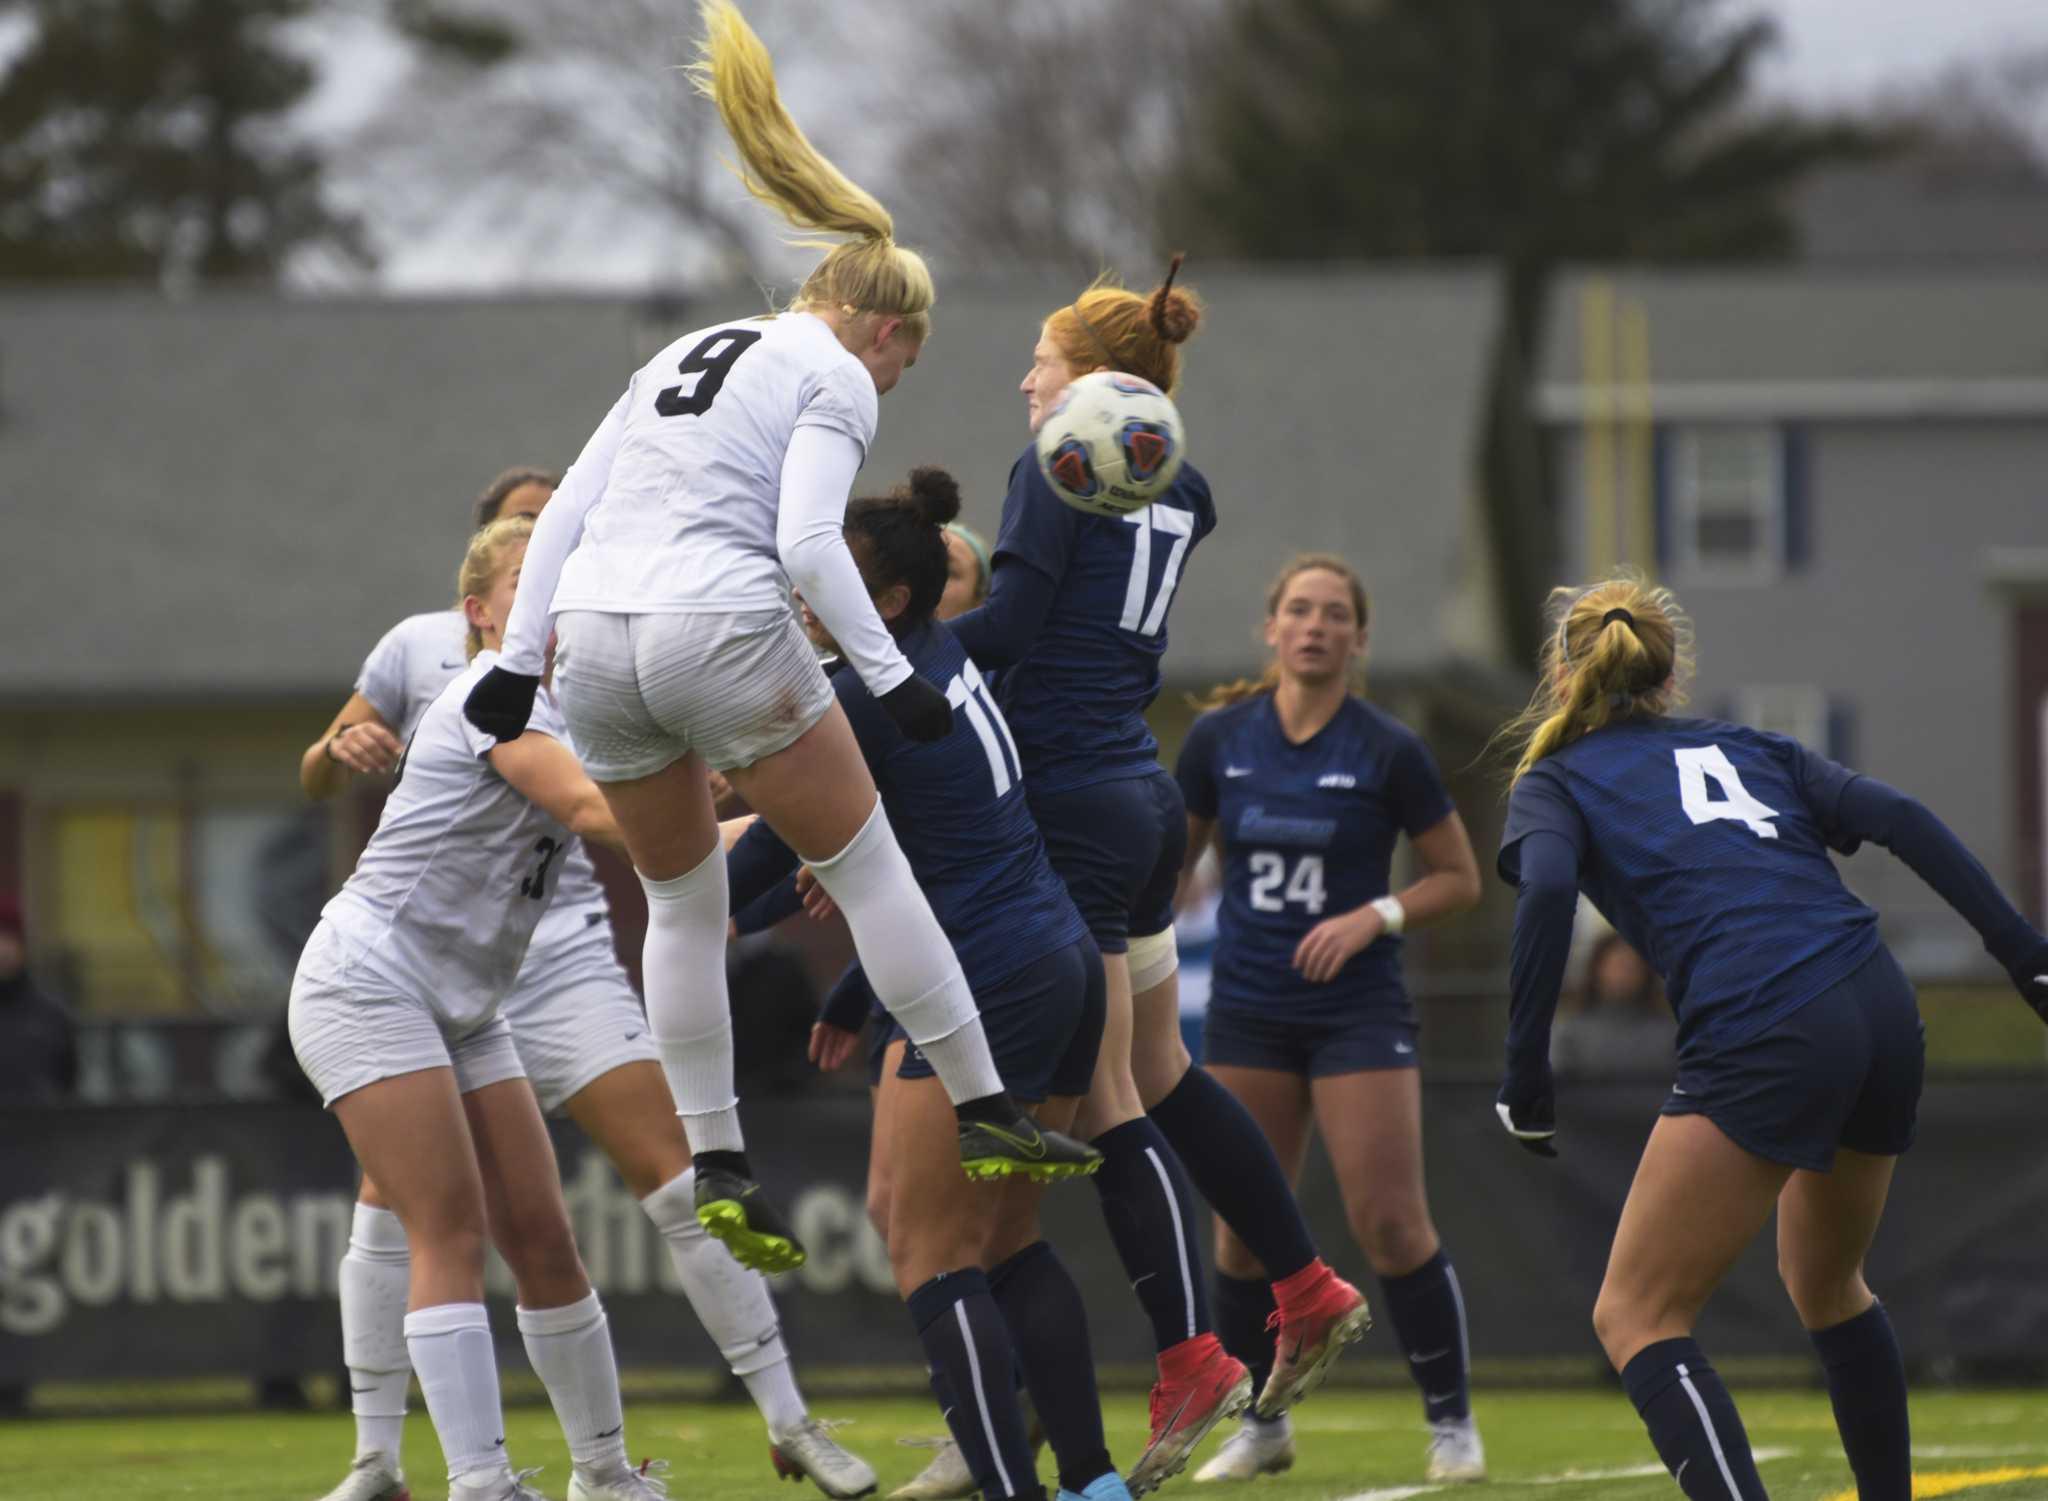 Saint Rose clinches eighth NE-10 title - Times Union